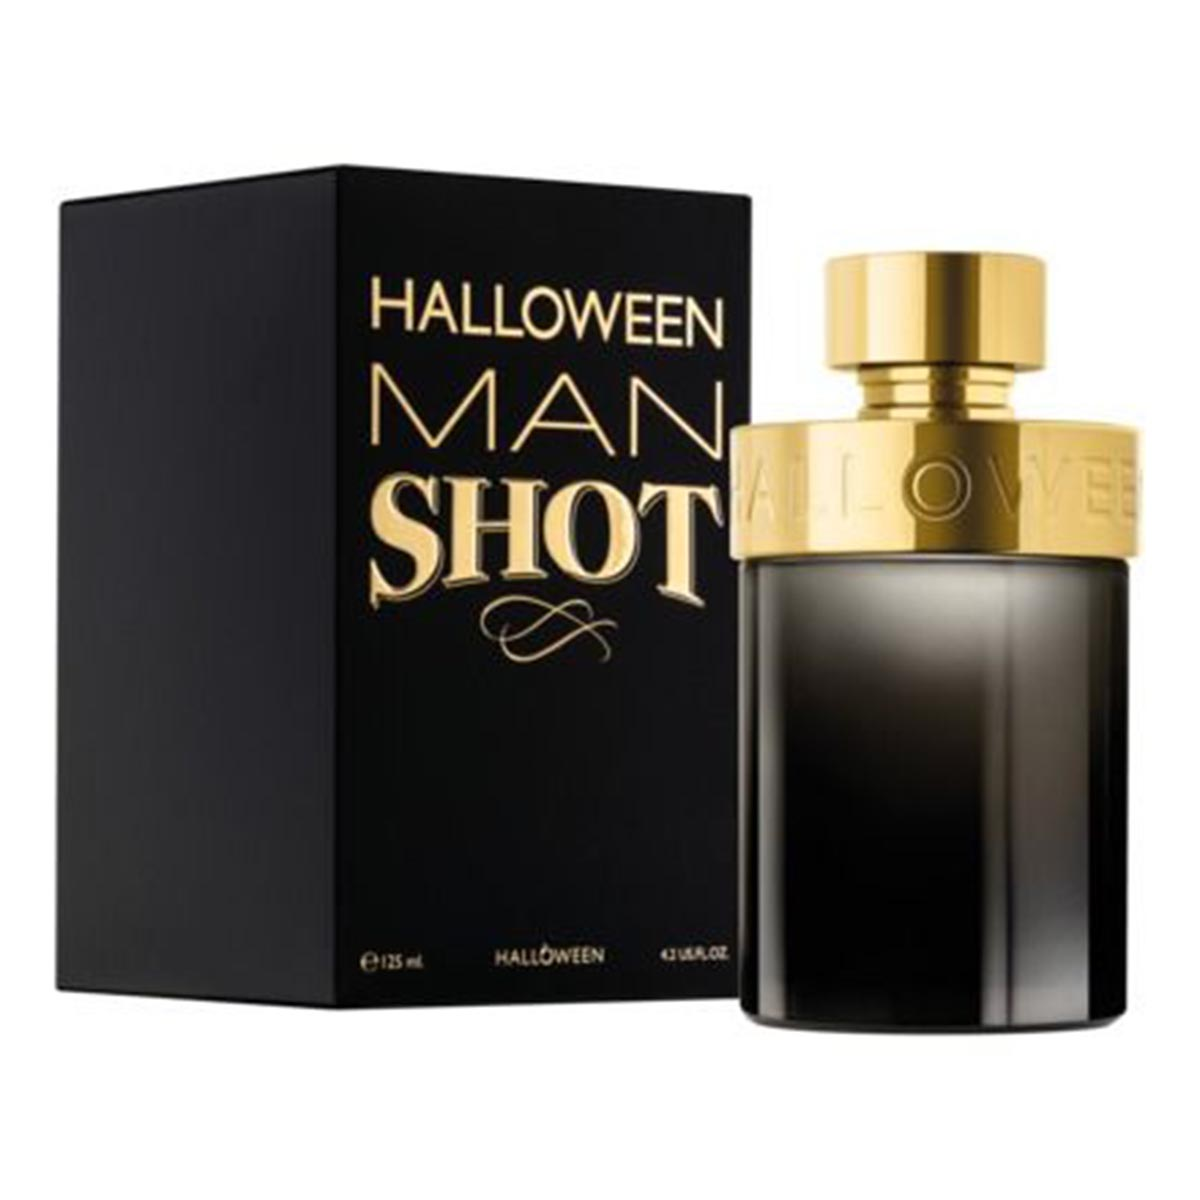 Jesus del pozo halloween man shot eau de toilette 75ml vaporizador